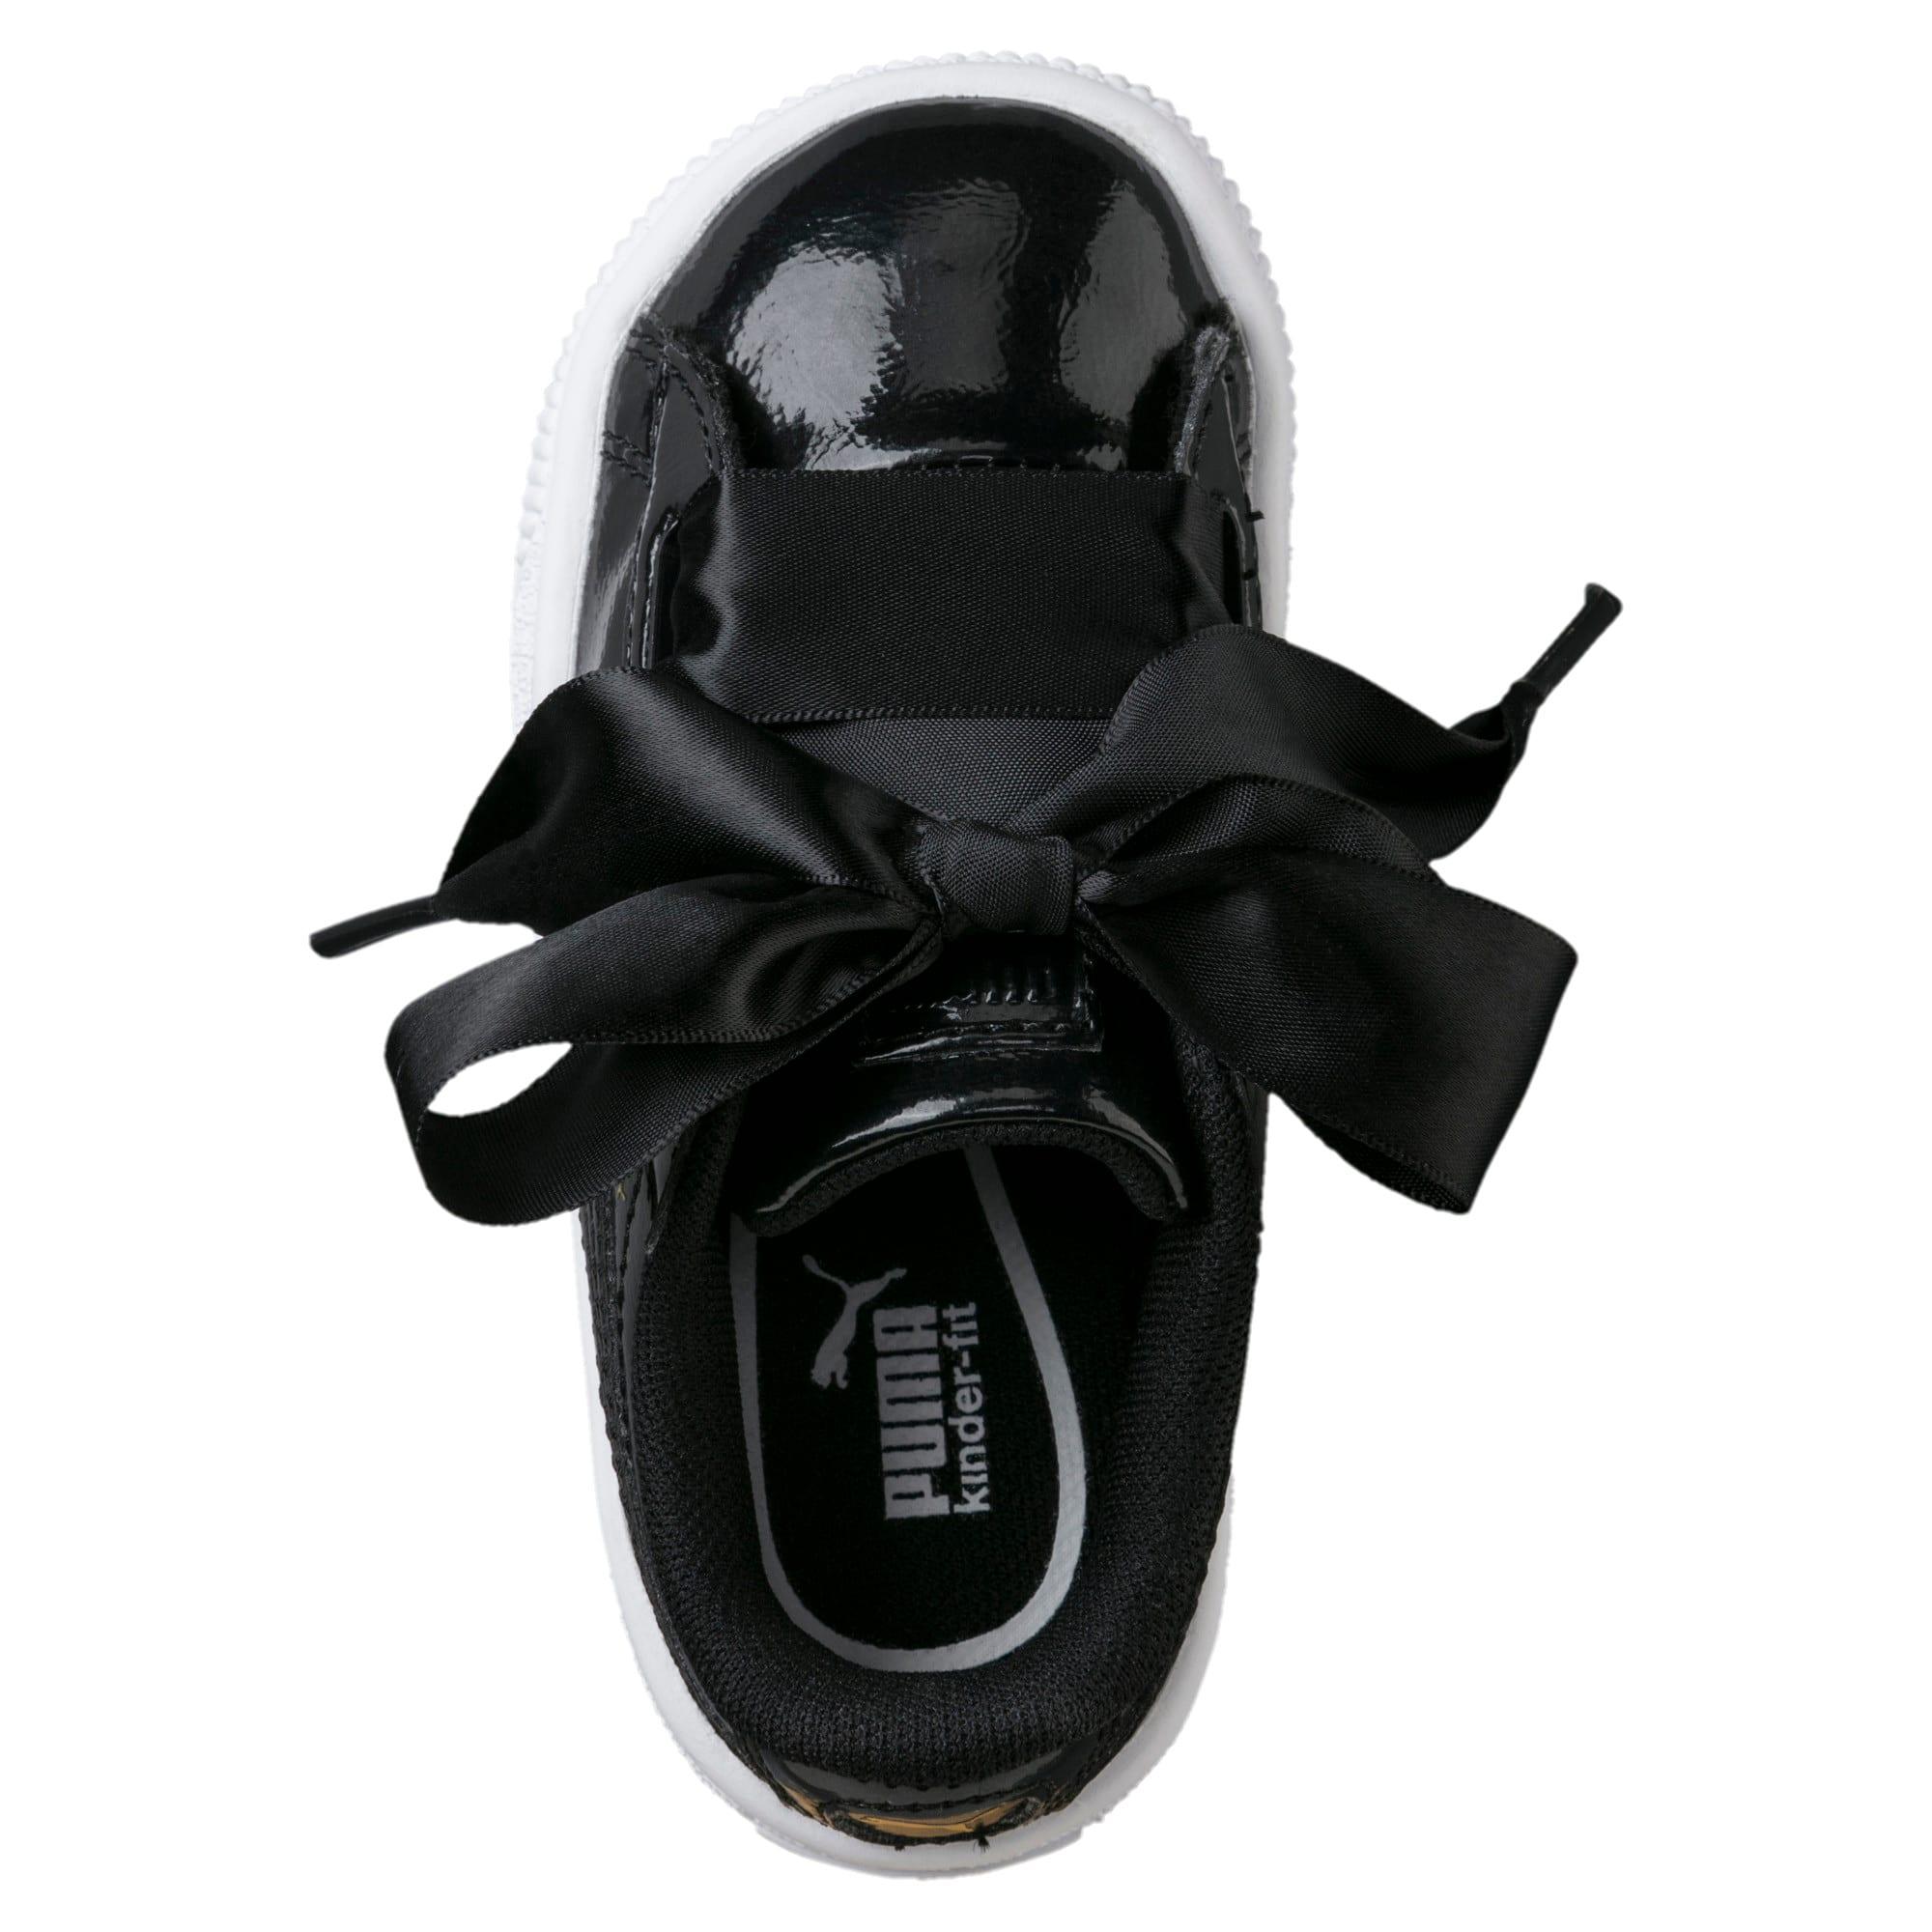 Thumbnail 5 of Basket Heart Glam Little Kids' Shoes, Puma Black-Puma Black, medium